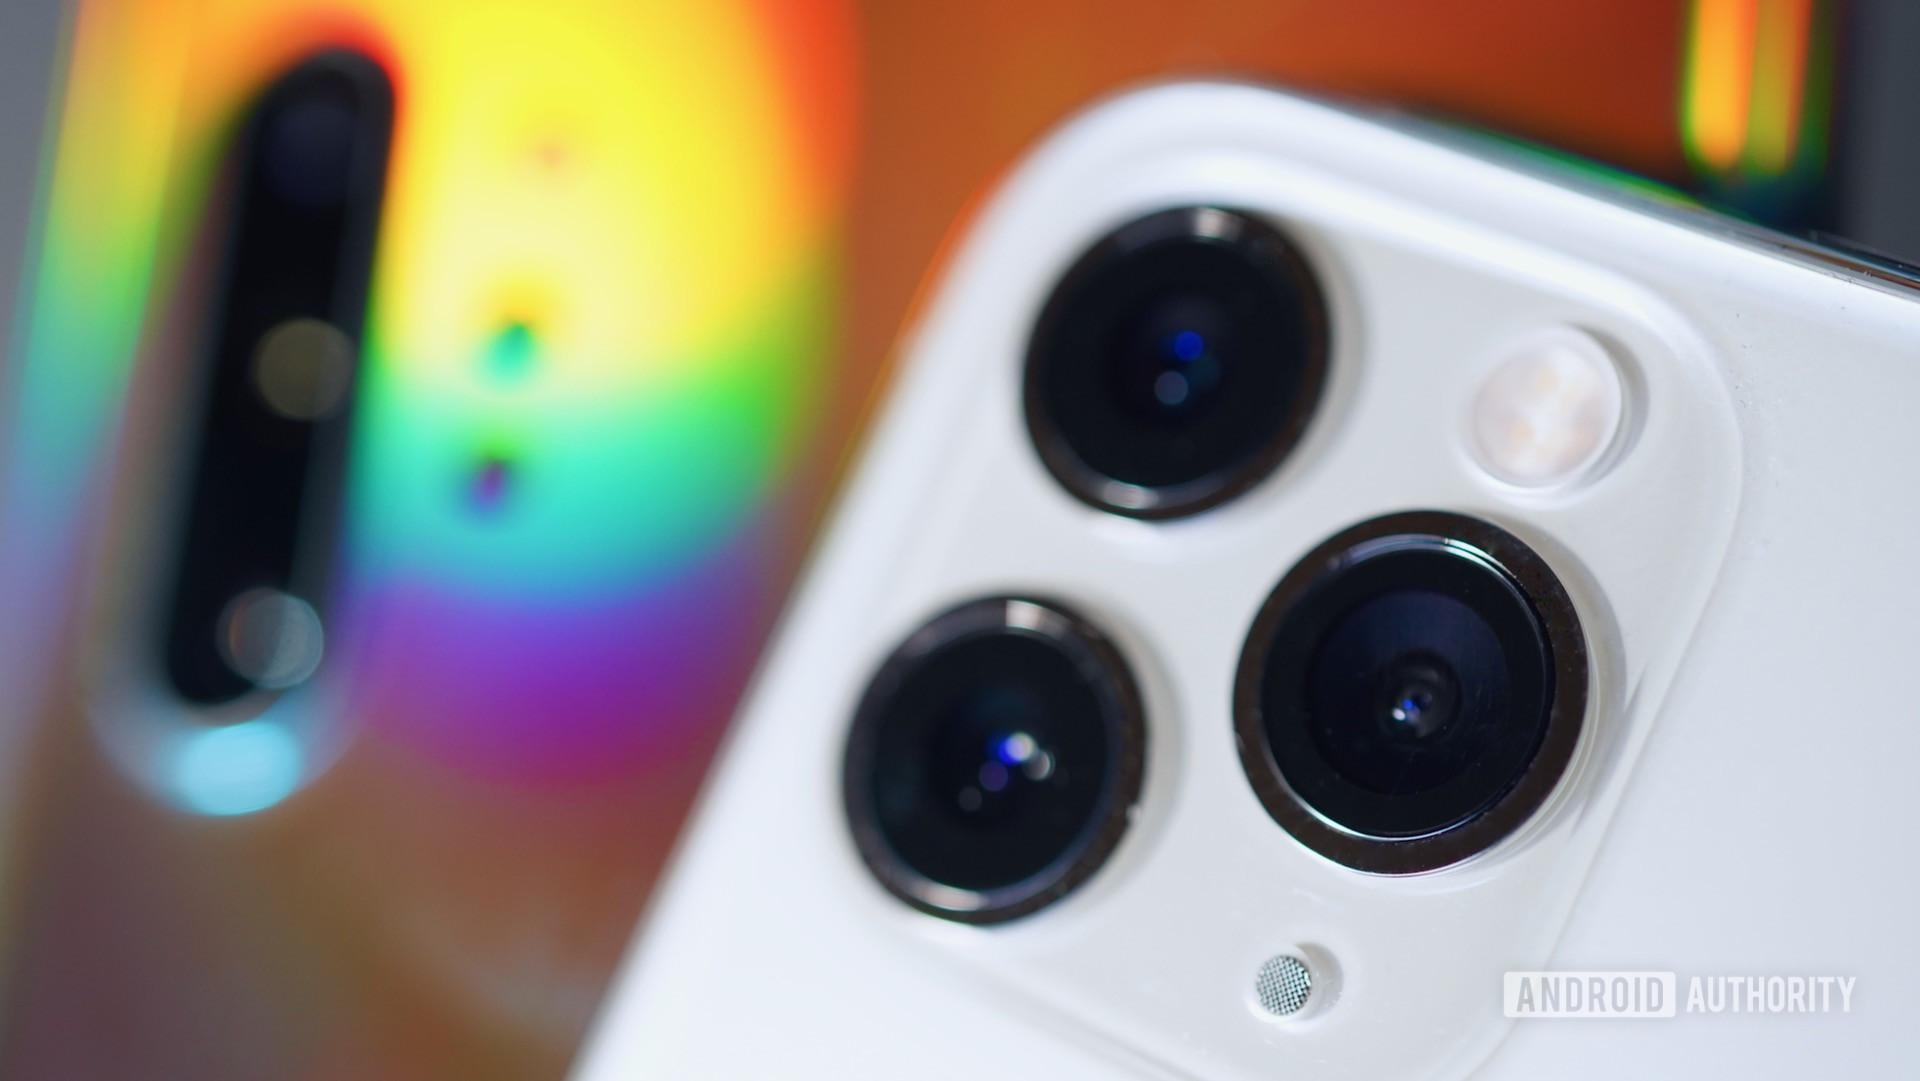 iPhone 11 Pro Samsung Galaxy Note 10 Plus camera closeups